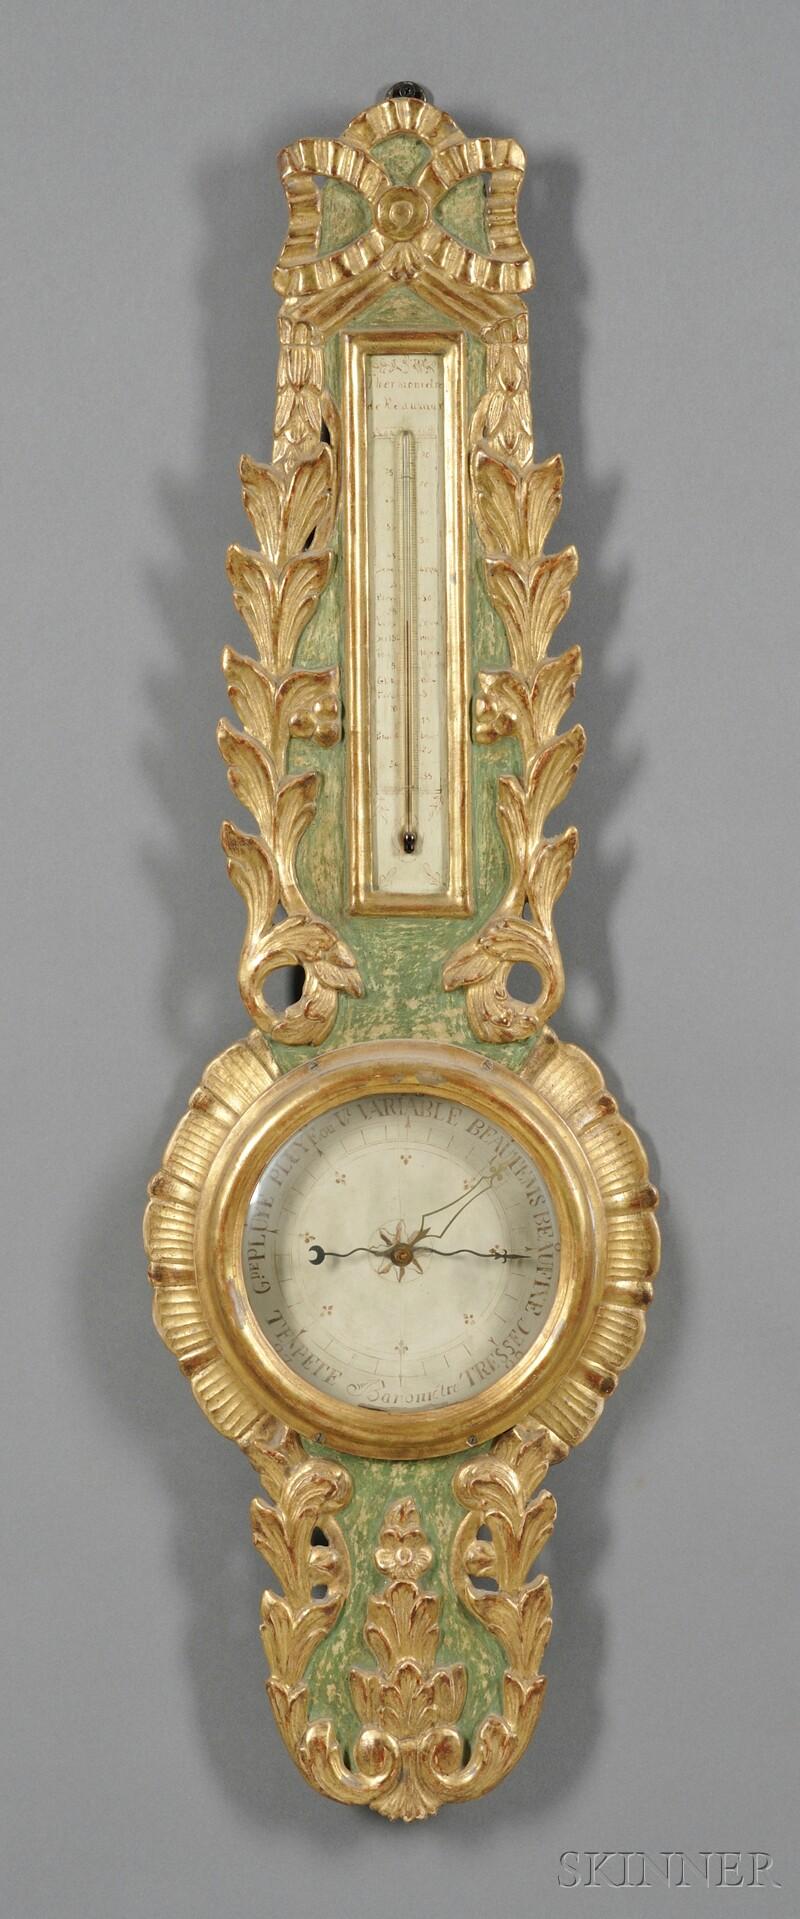 French Parcel-gilt Wheel Barometer